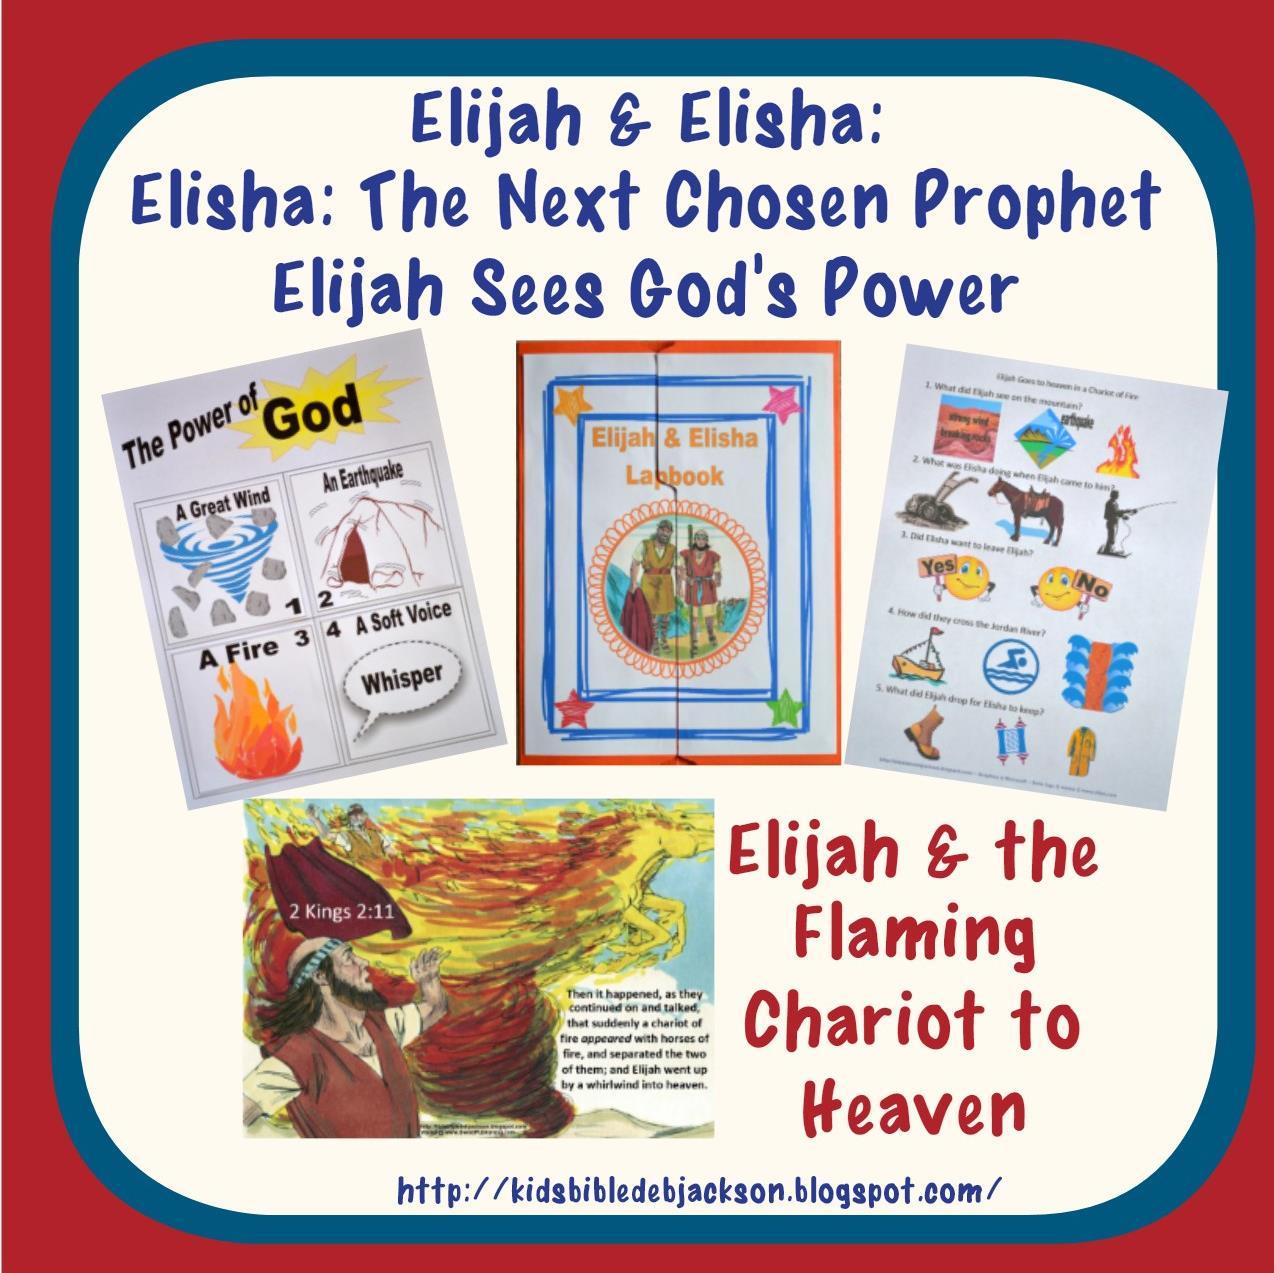 http://kidsbibledebjackson.blogspot.com/2014/03/elijah-flaming-chariot-to-heaven.html